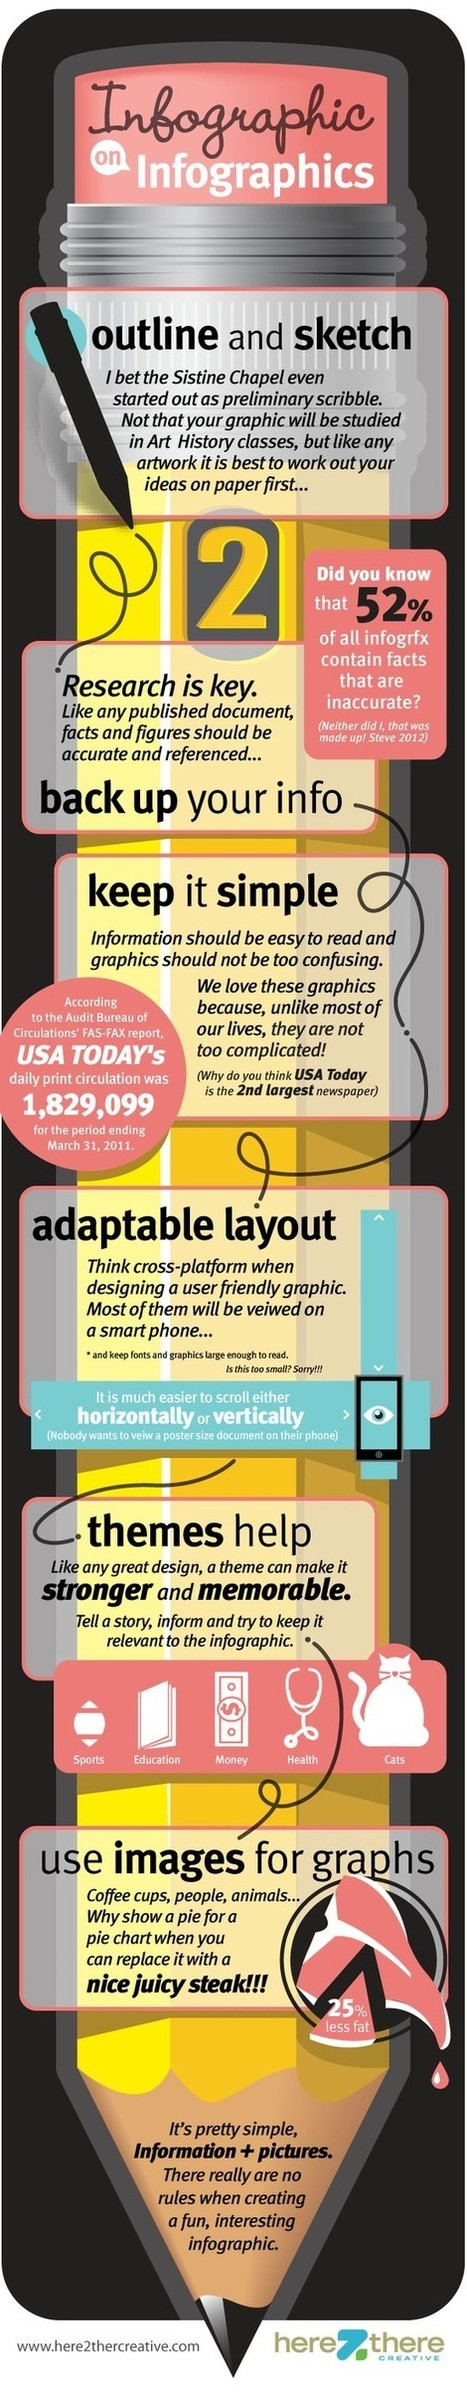 Digital Marketing | Infographics and Social Media | Scoop.it